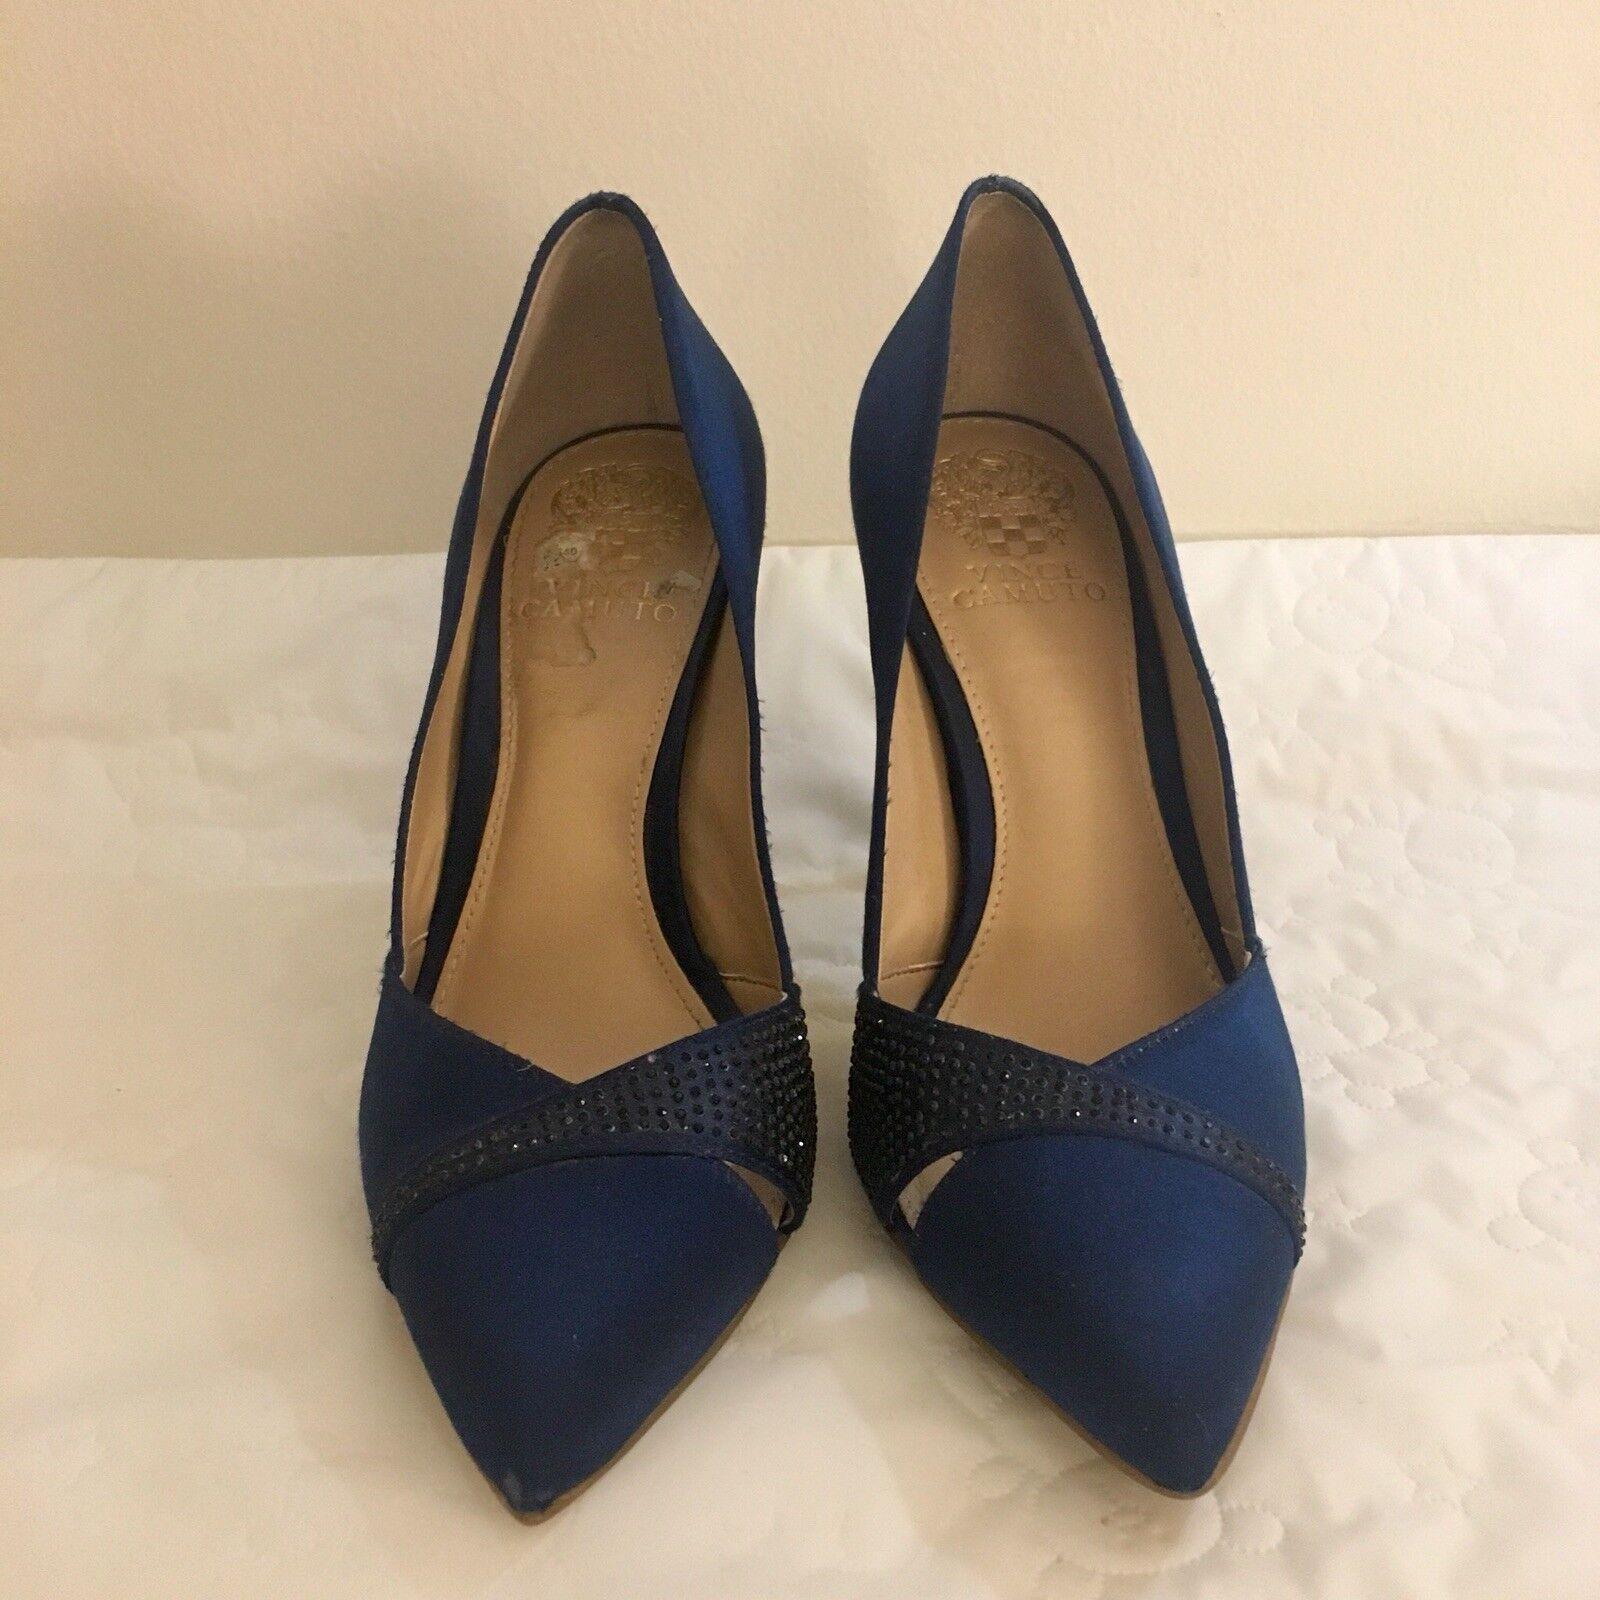 shoes women high heels vince camuto pumps